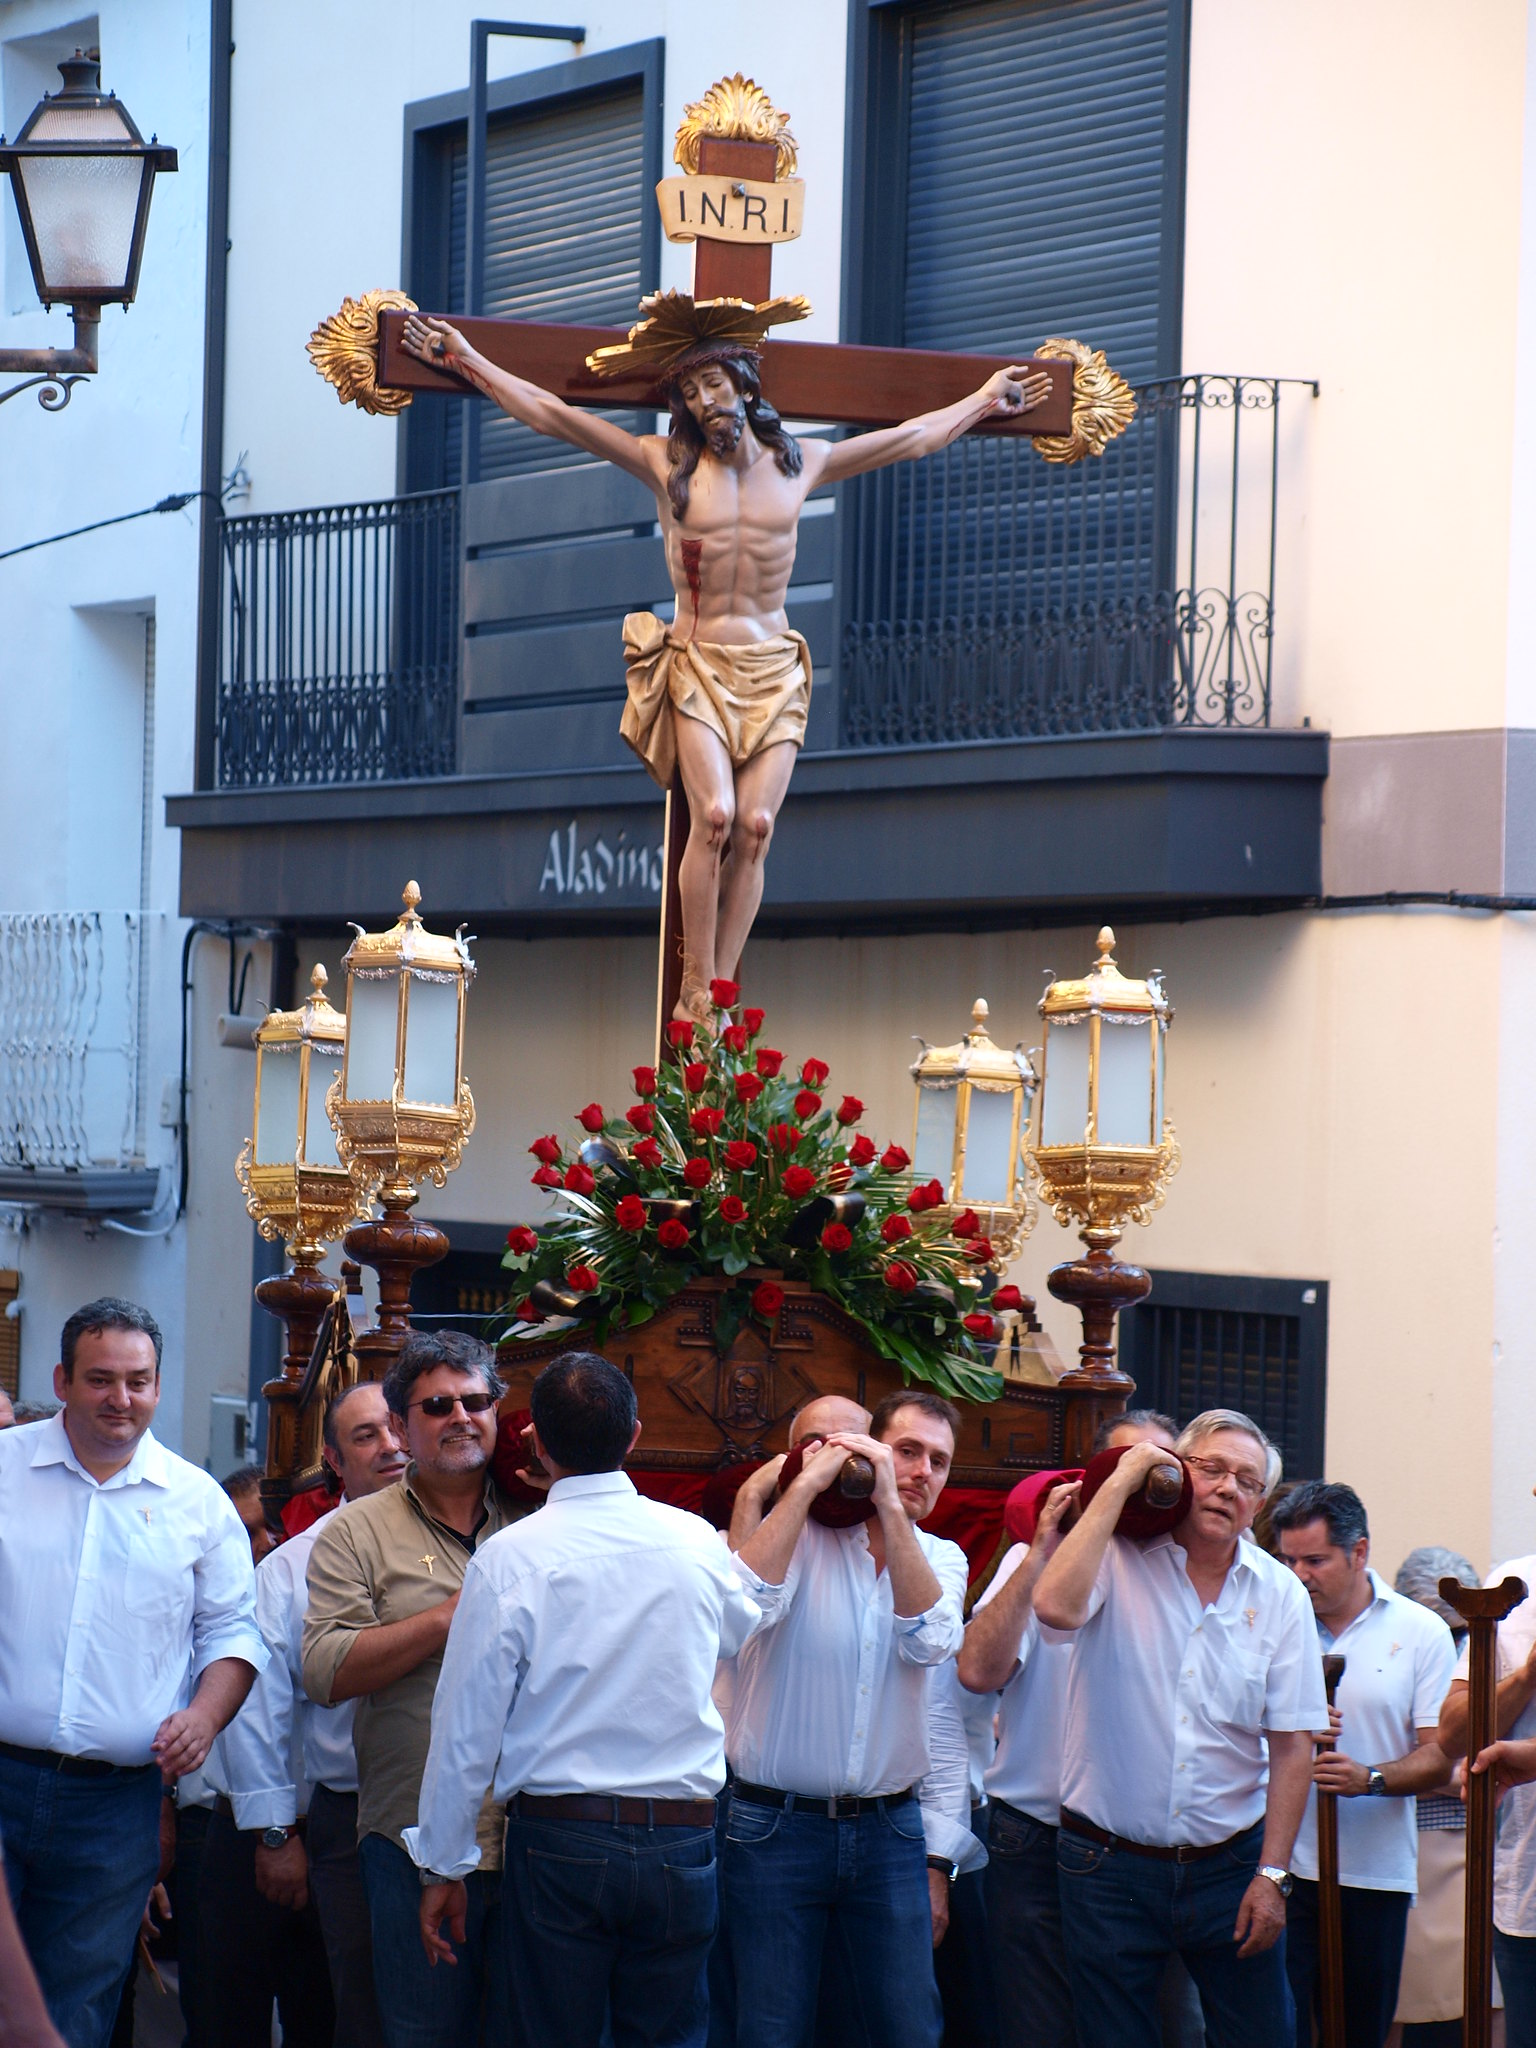 (2014-06-27) - Bajada Vía Crucis - Paloma Romero Torralba (31)